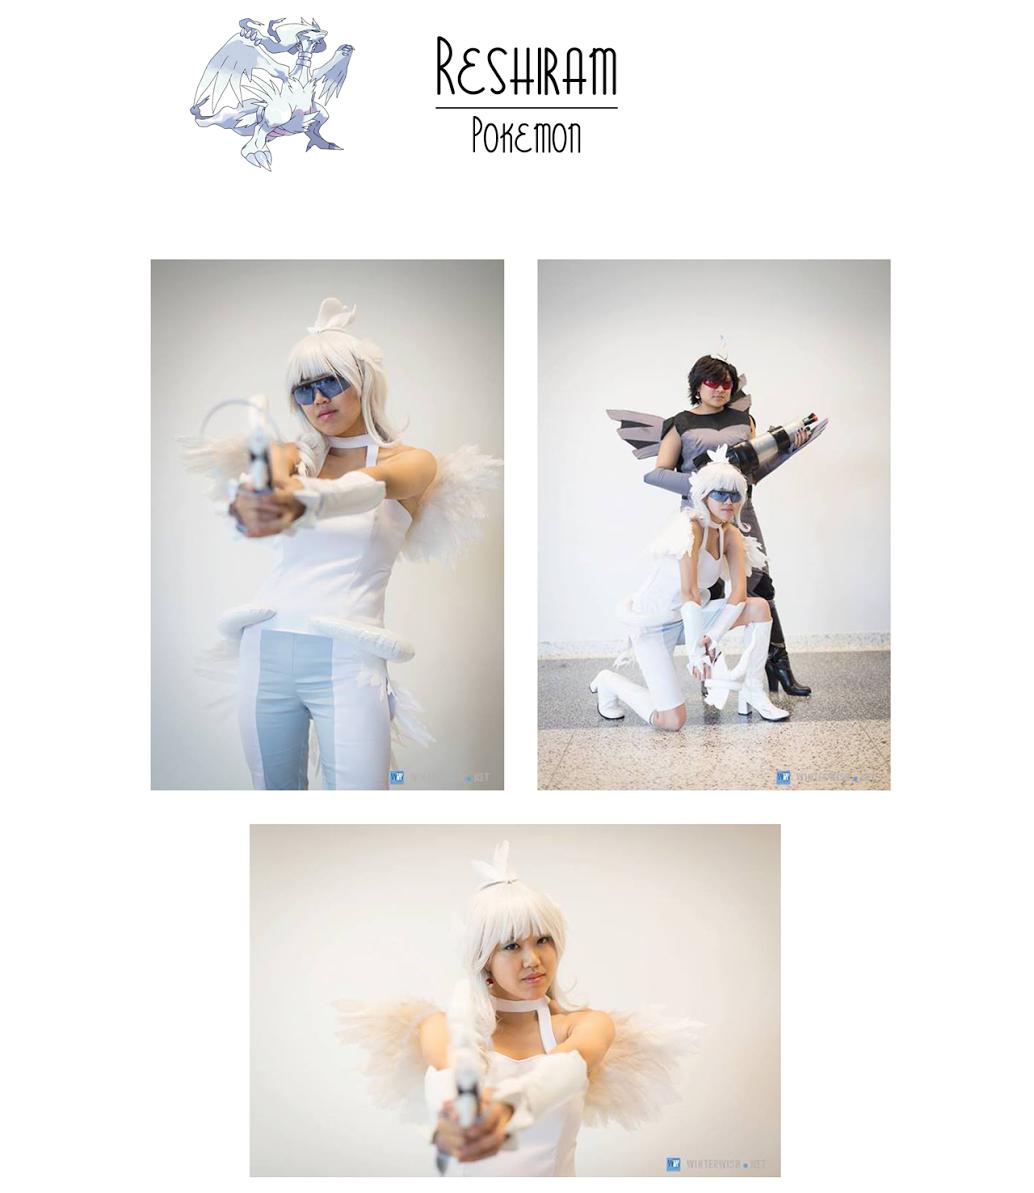 portfolio_costumeconstruction_reshiram.png